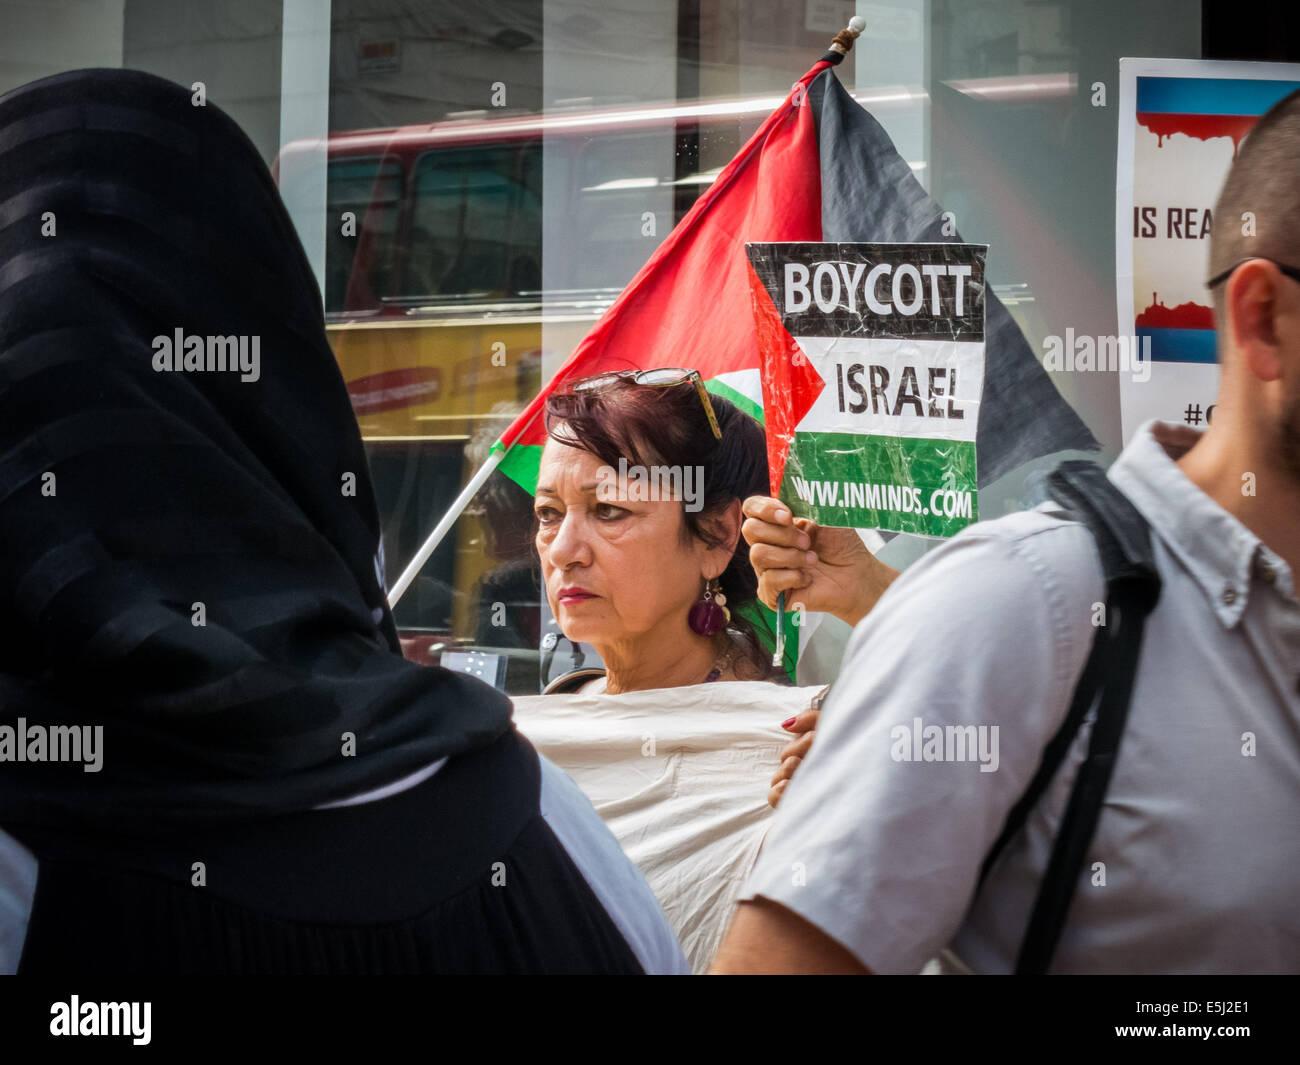 London, UK. 1st Aug, 2014. Protest at De Beers calls for Boycott of Israeli 'Blood Diamonds' Credit:  Guy - Stock Image